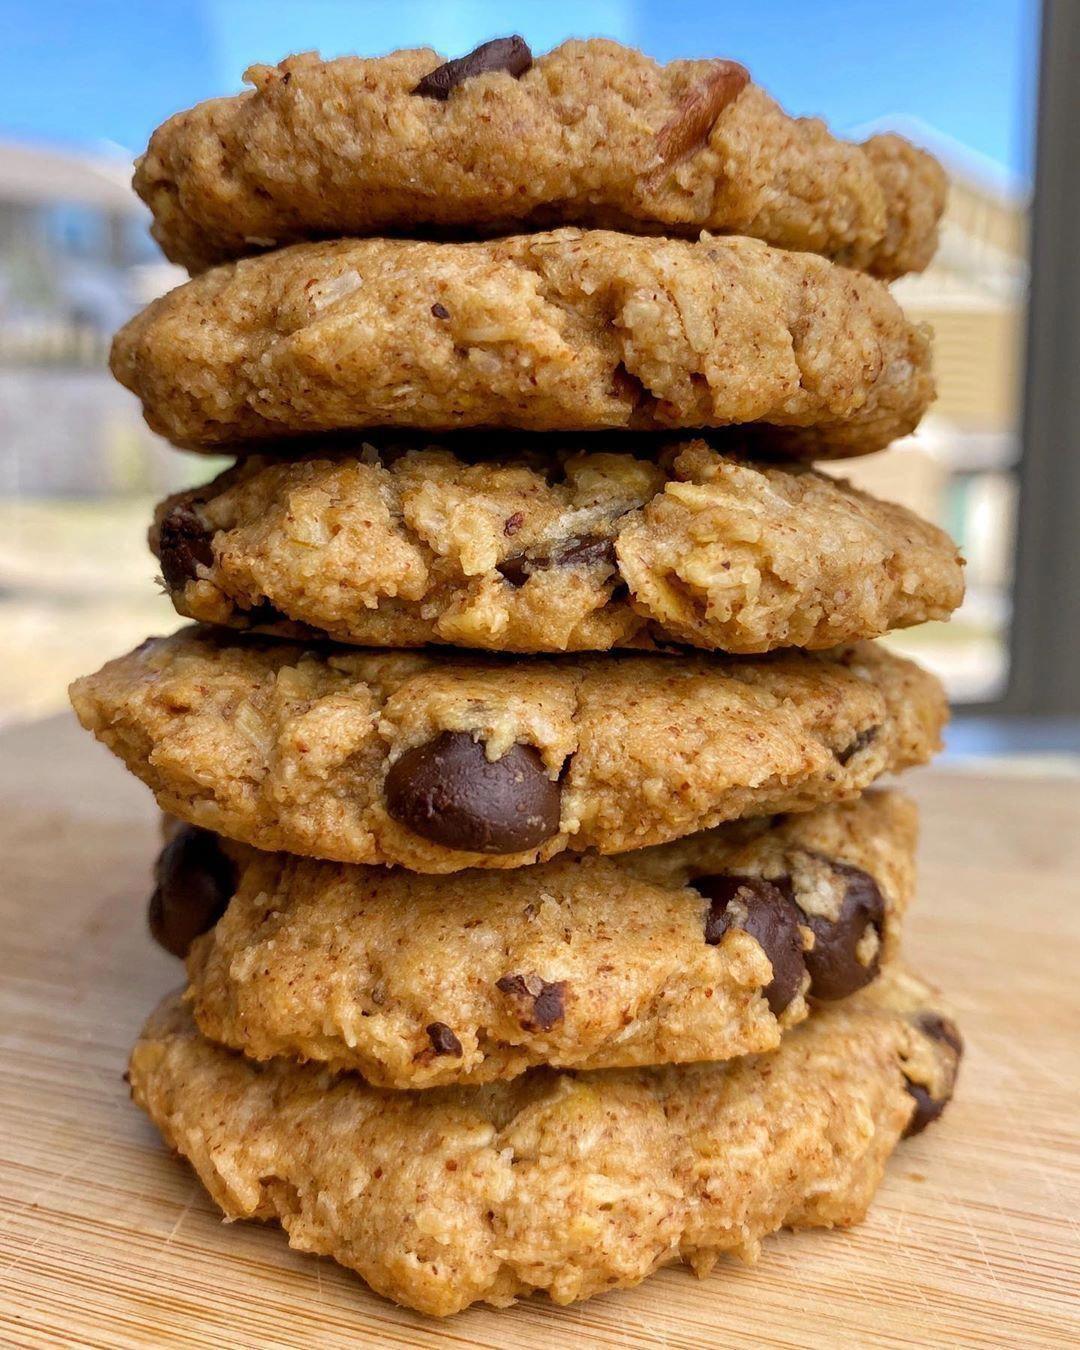 Vegan Cowboy Cookie Recipe Healthy Gluten Free Cowboycookies In 2020 With Images Healthy Cookie Recipes Cookie Recipes Easy Cookie Recipes